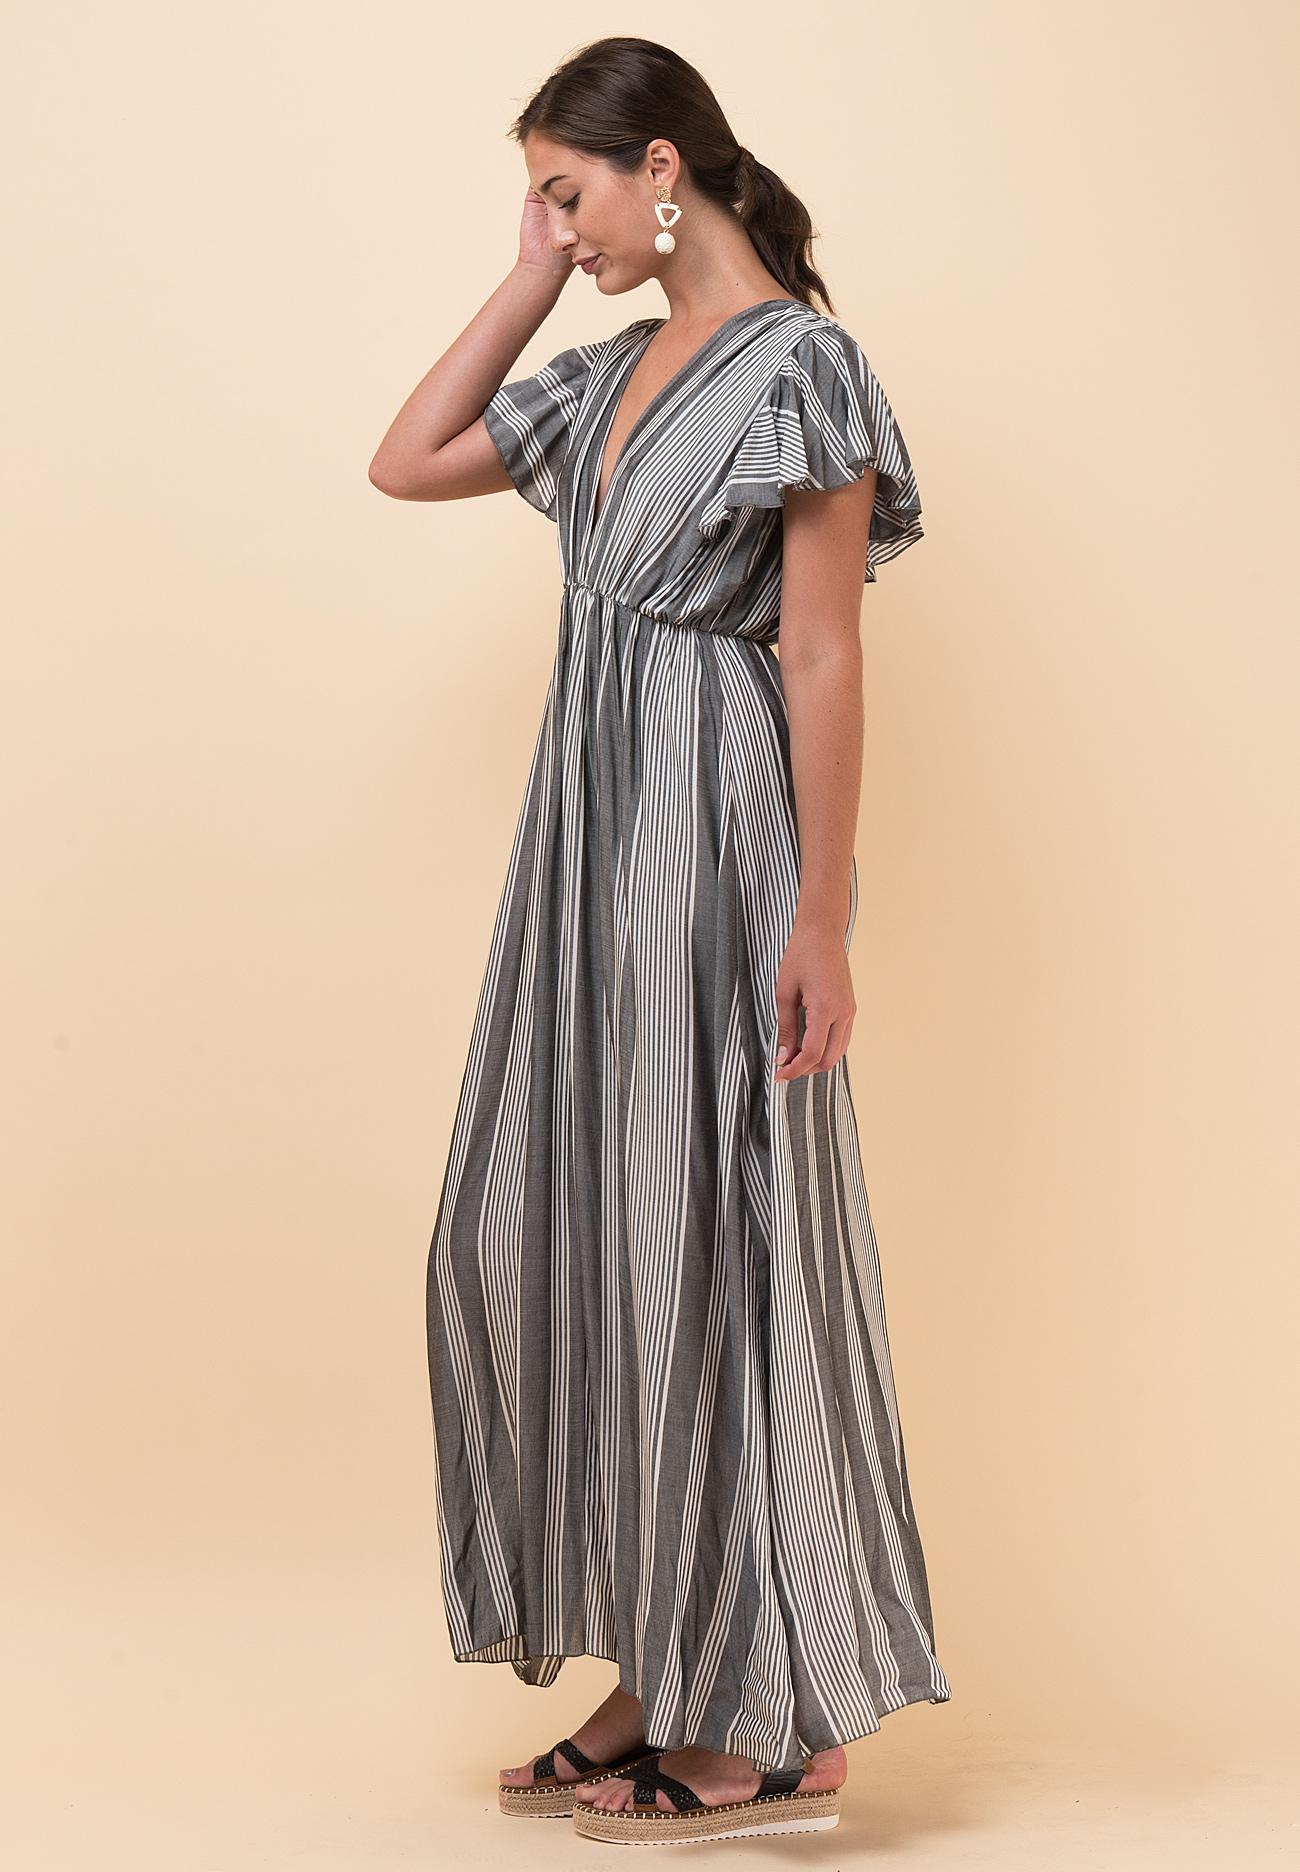 66c10c8a989 Maxi ριγέ φόρεμα με V ντεκολτέ - ZIC ZAC